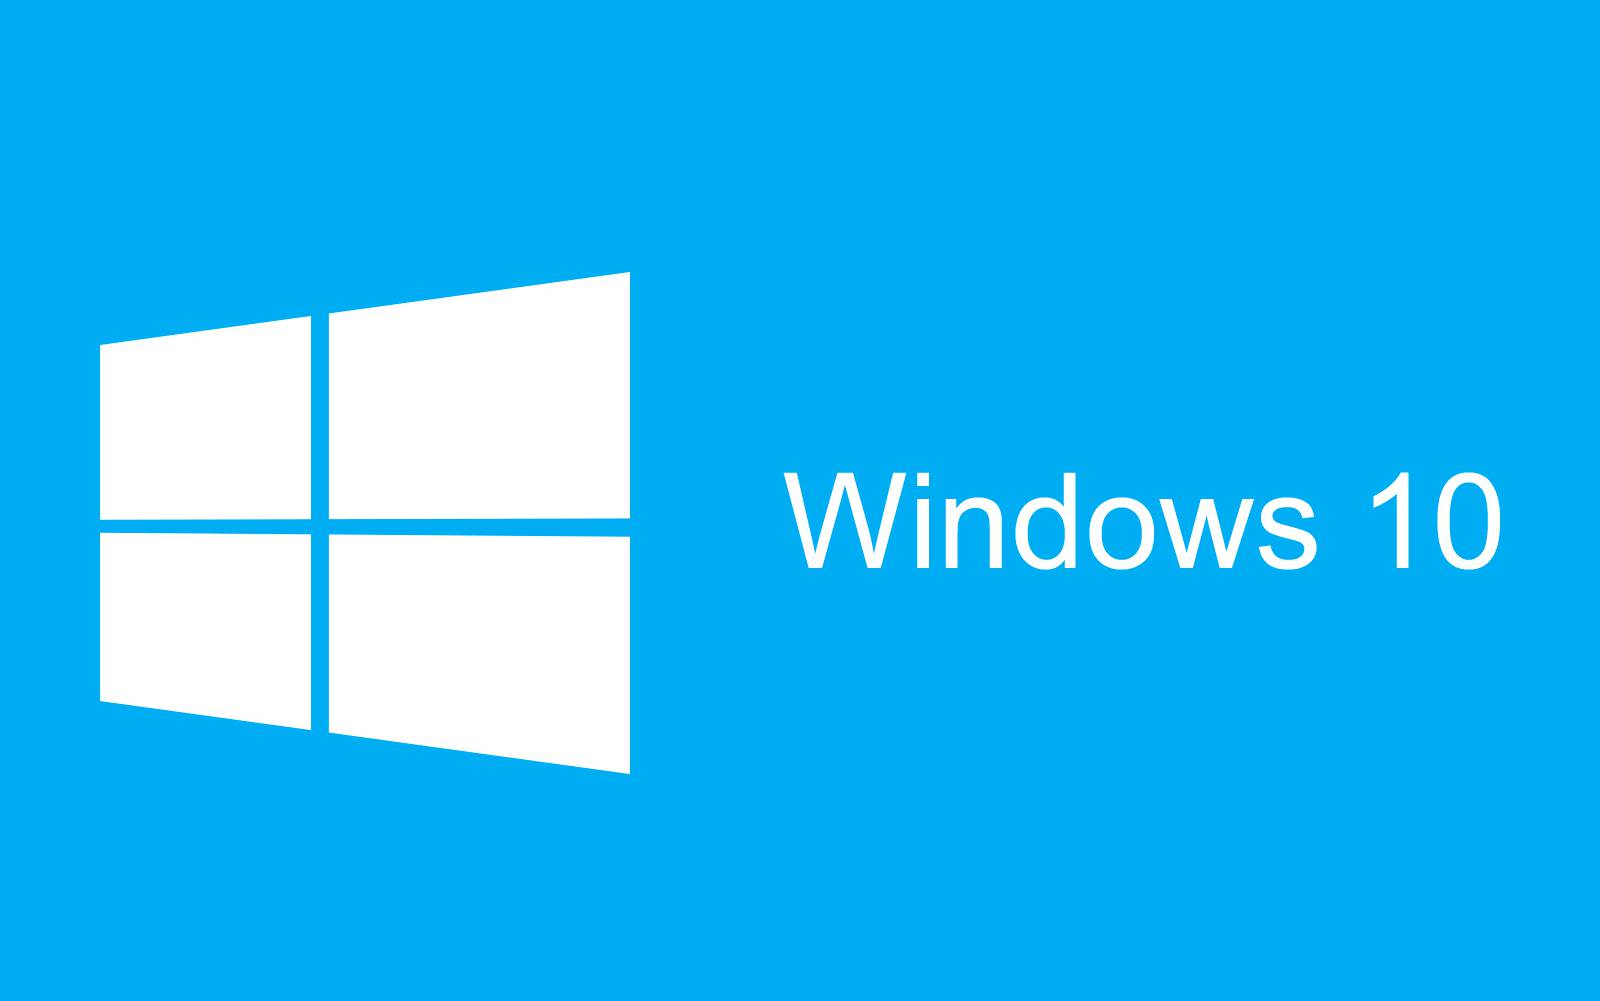 Windows 10 frustrare